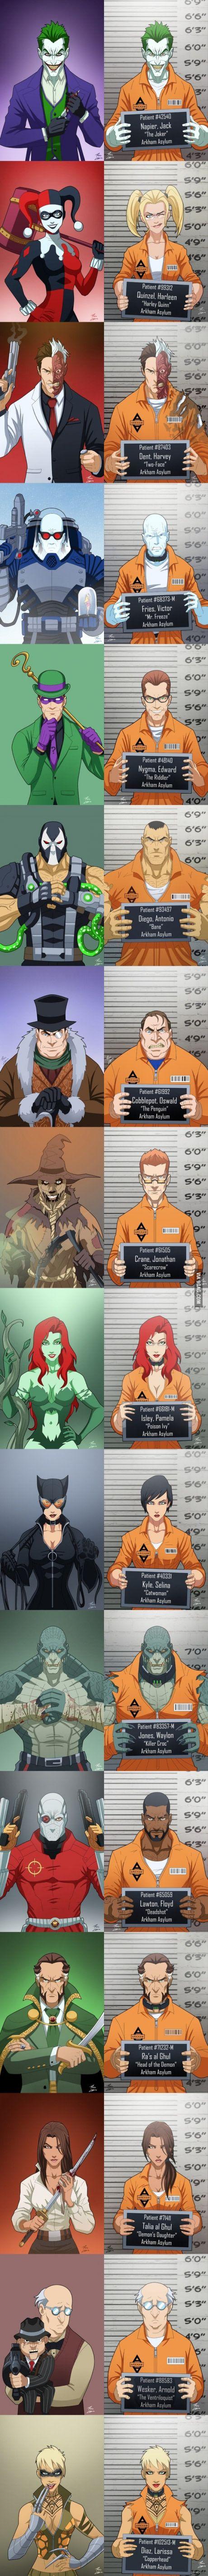 Batman's villains real names!